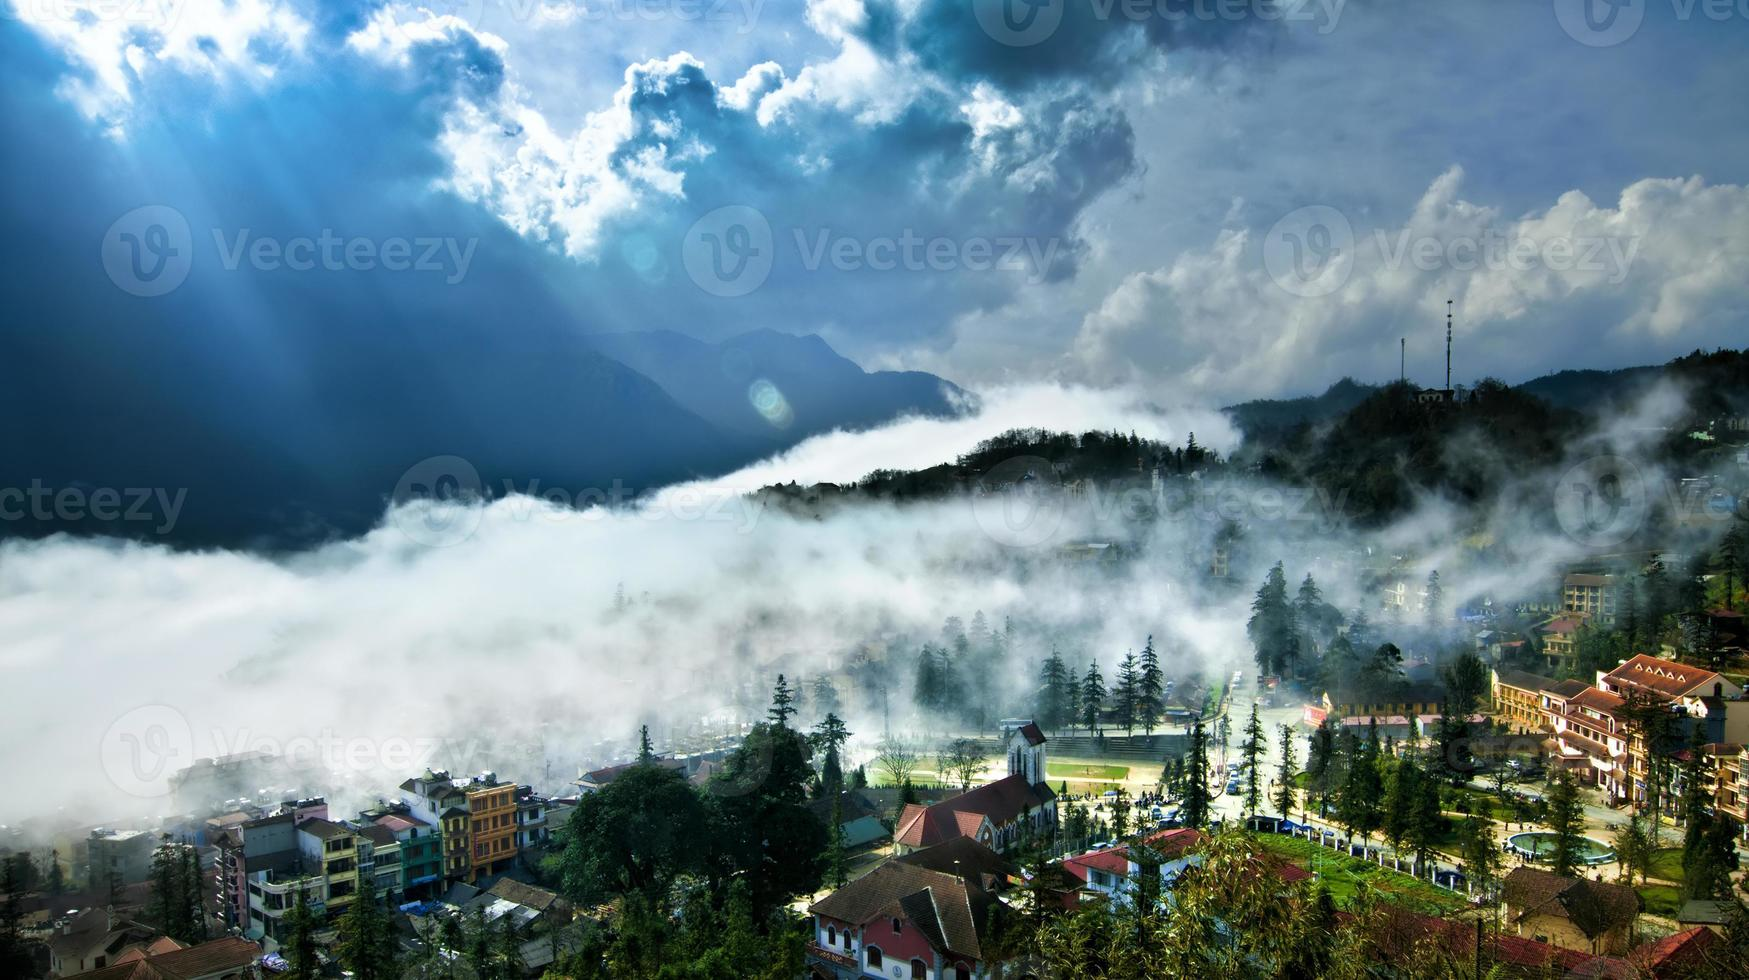 sapa dans la brume, lao cai, vietnam. photo